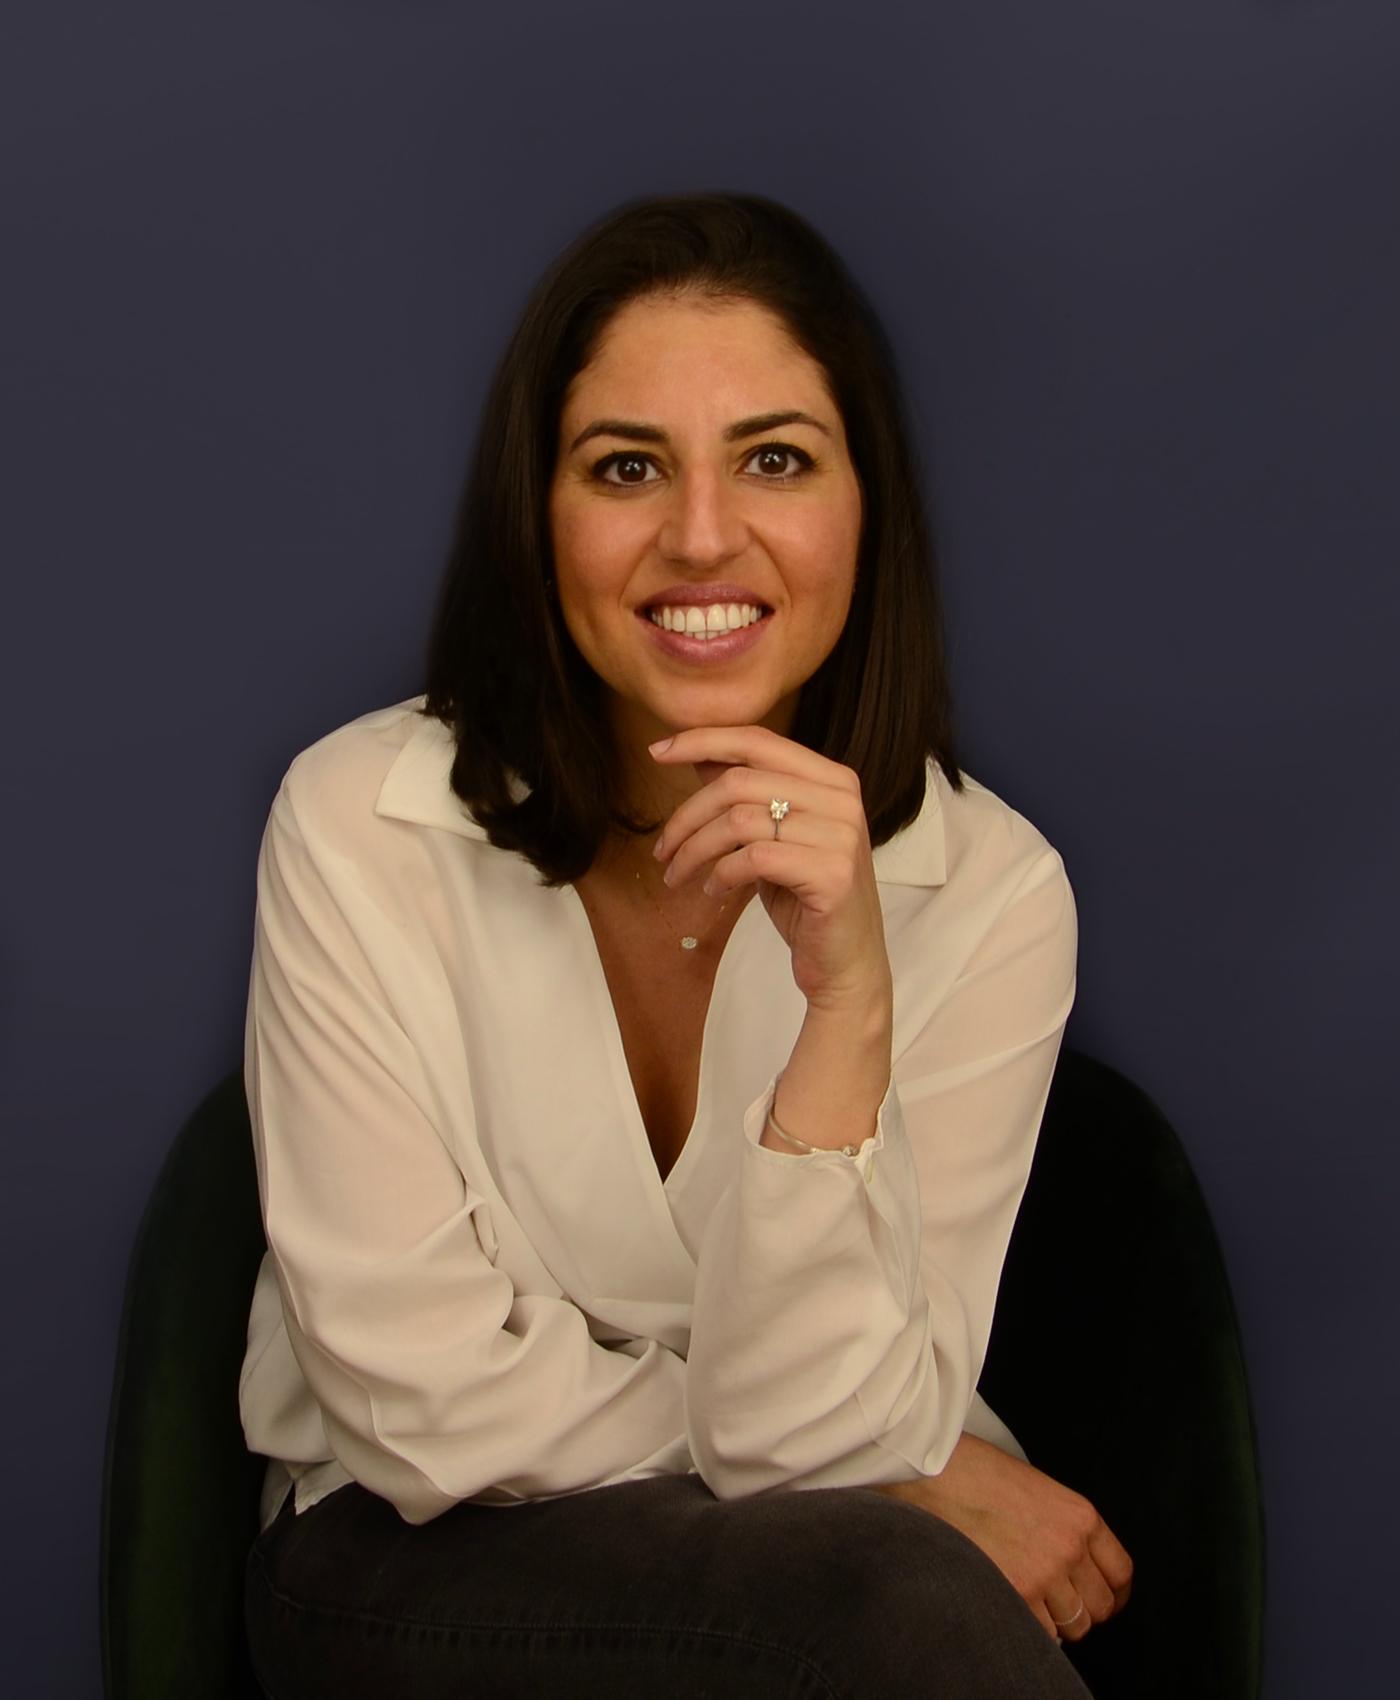 Vanessa Sellem